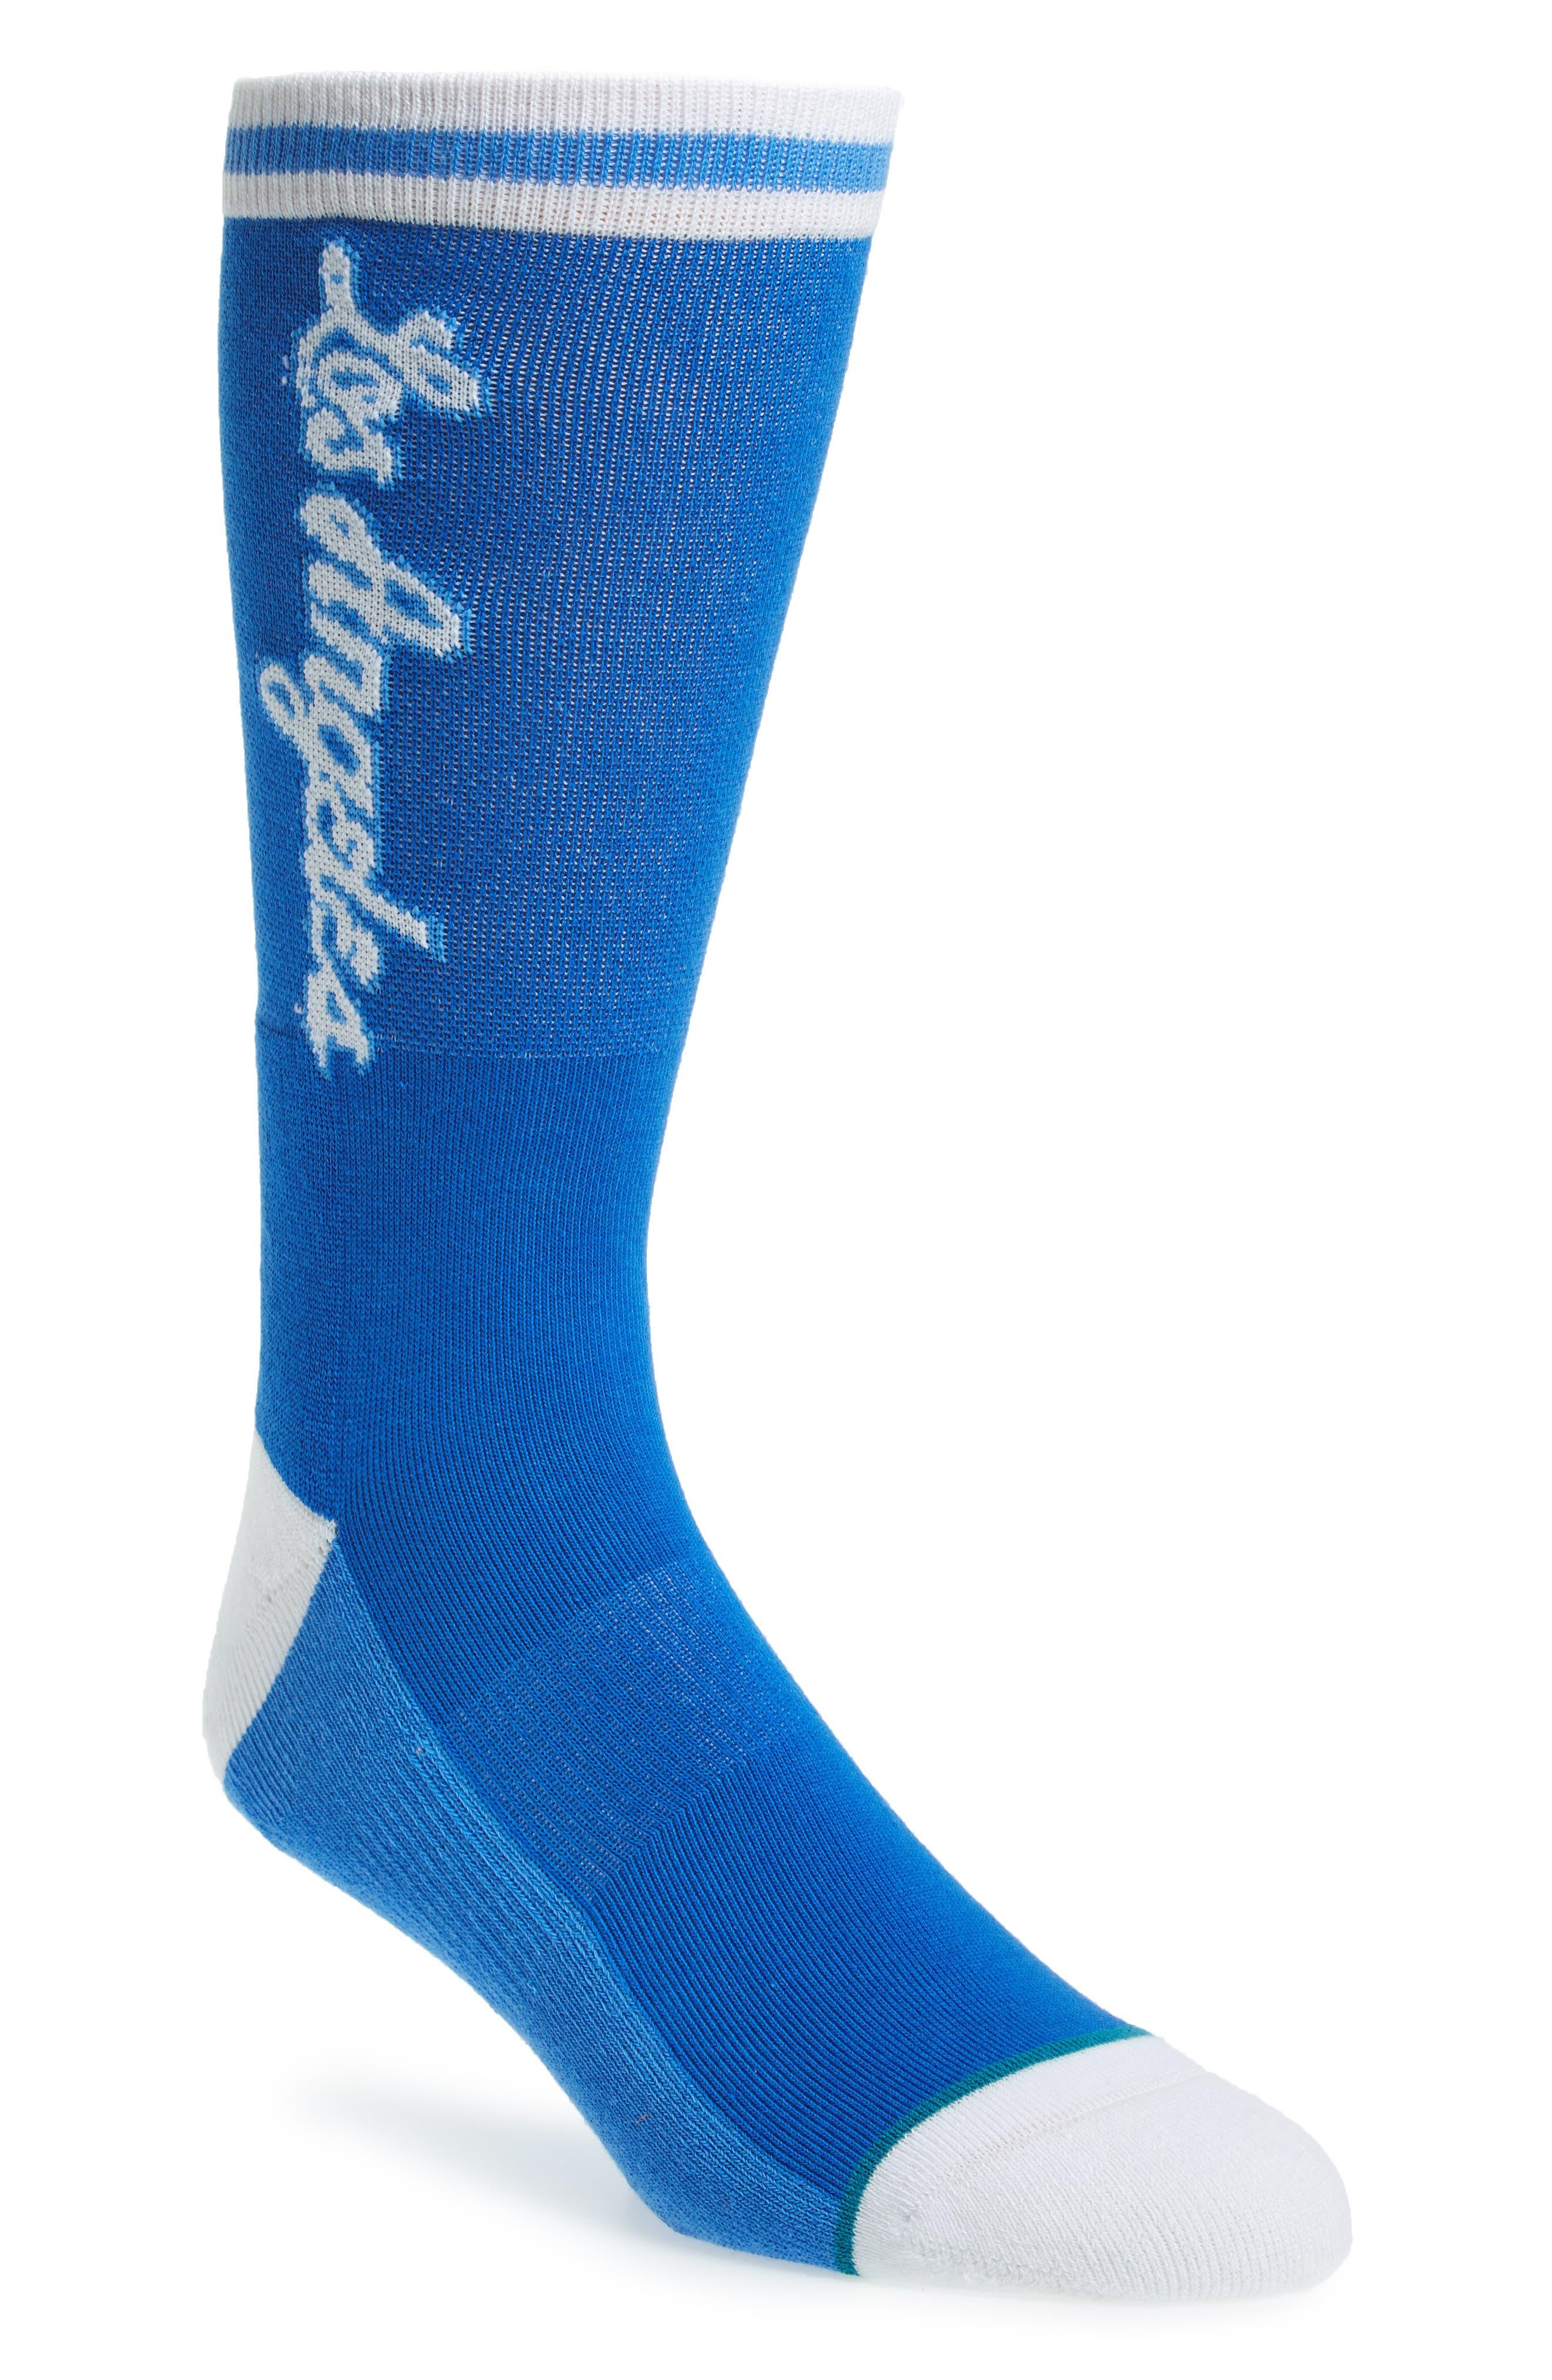 NBA Hardwood Los Angeles Lakers Socks,                         Main,                         color, 420